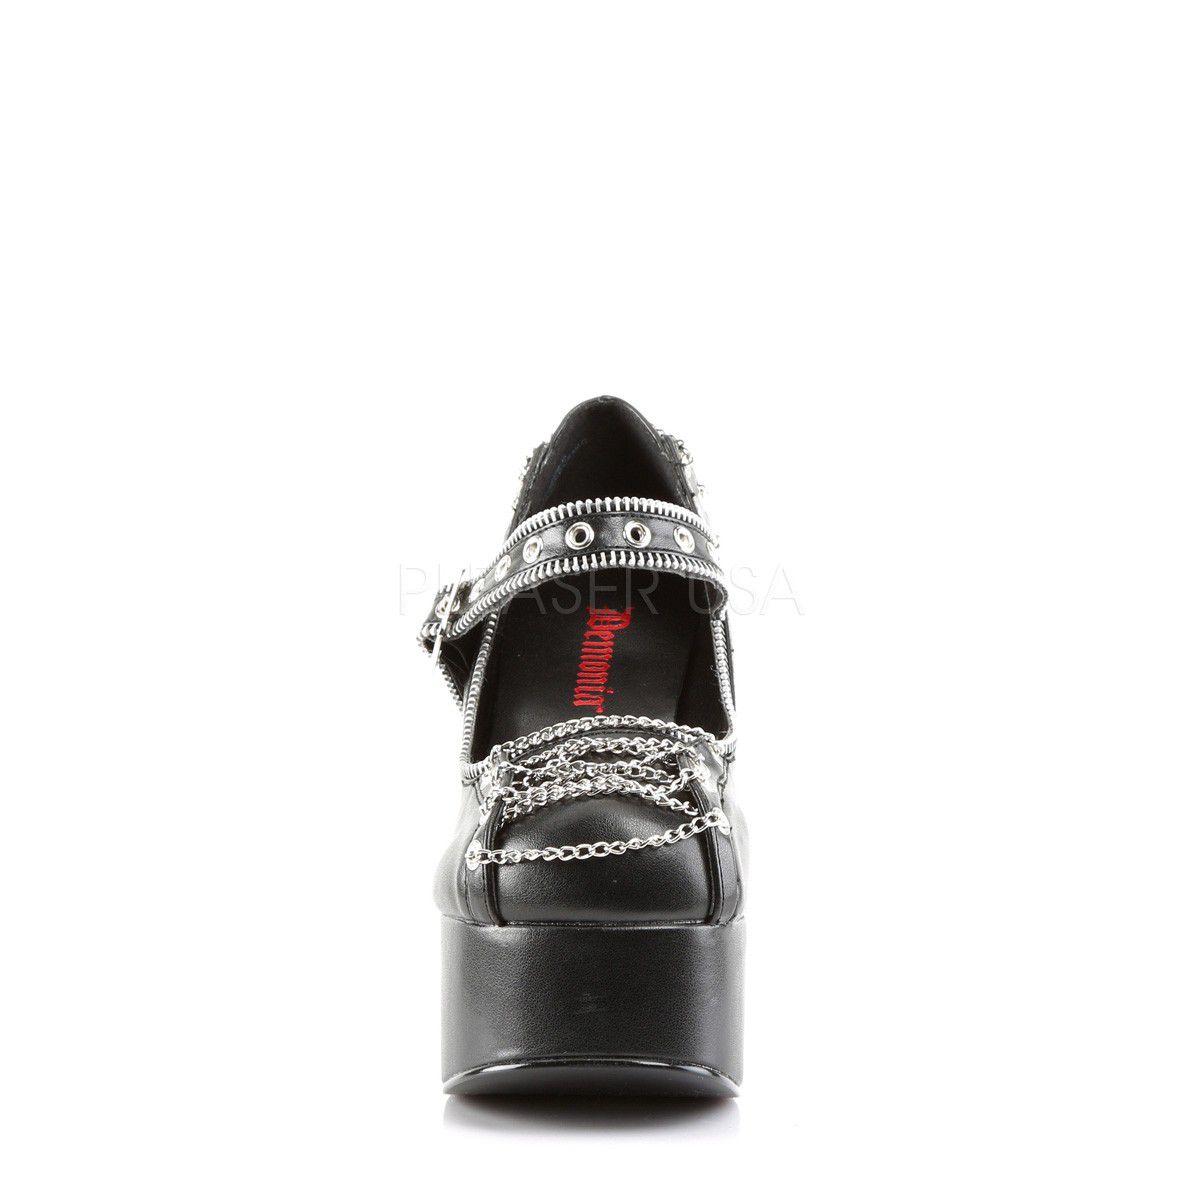 Sapato Charade 25 - Demonia (encomenda)